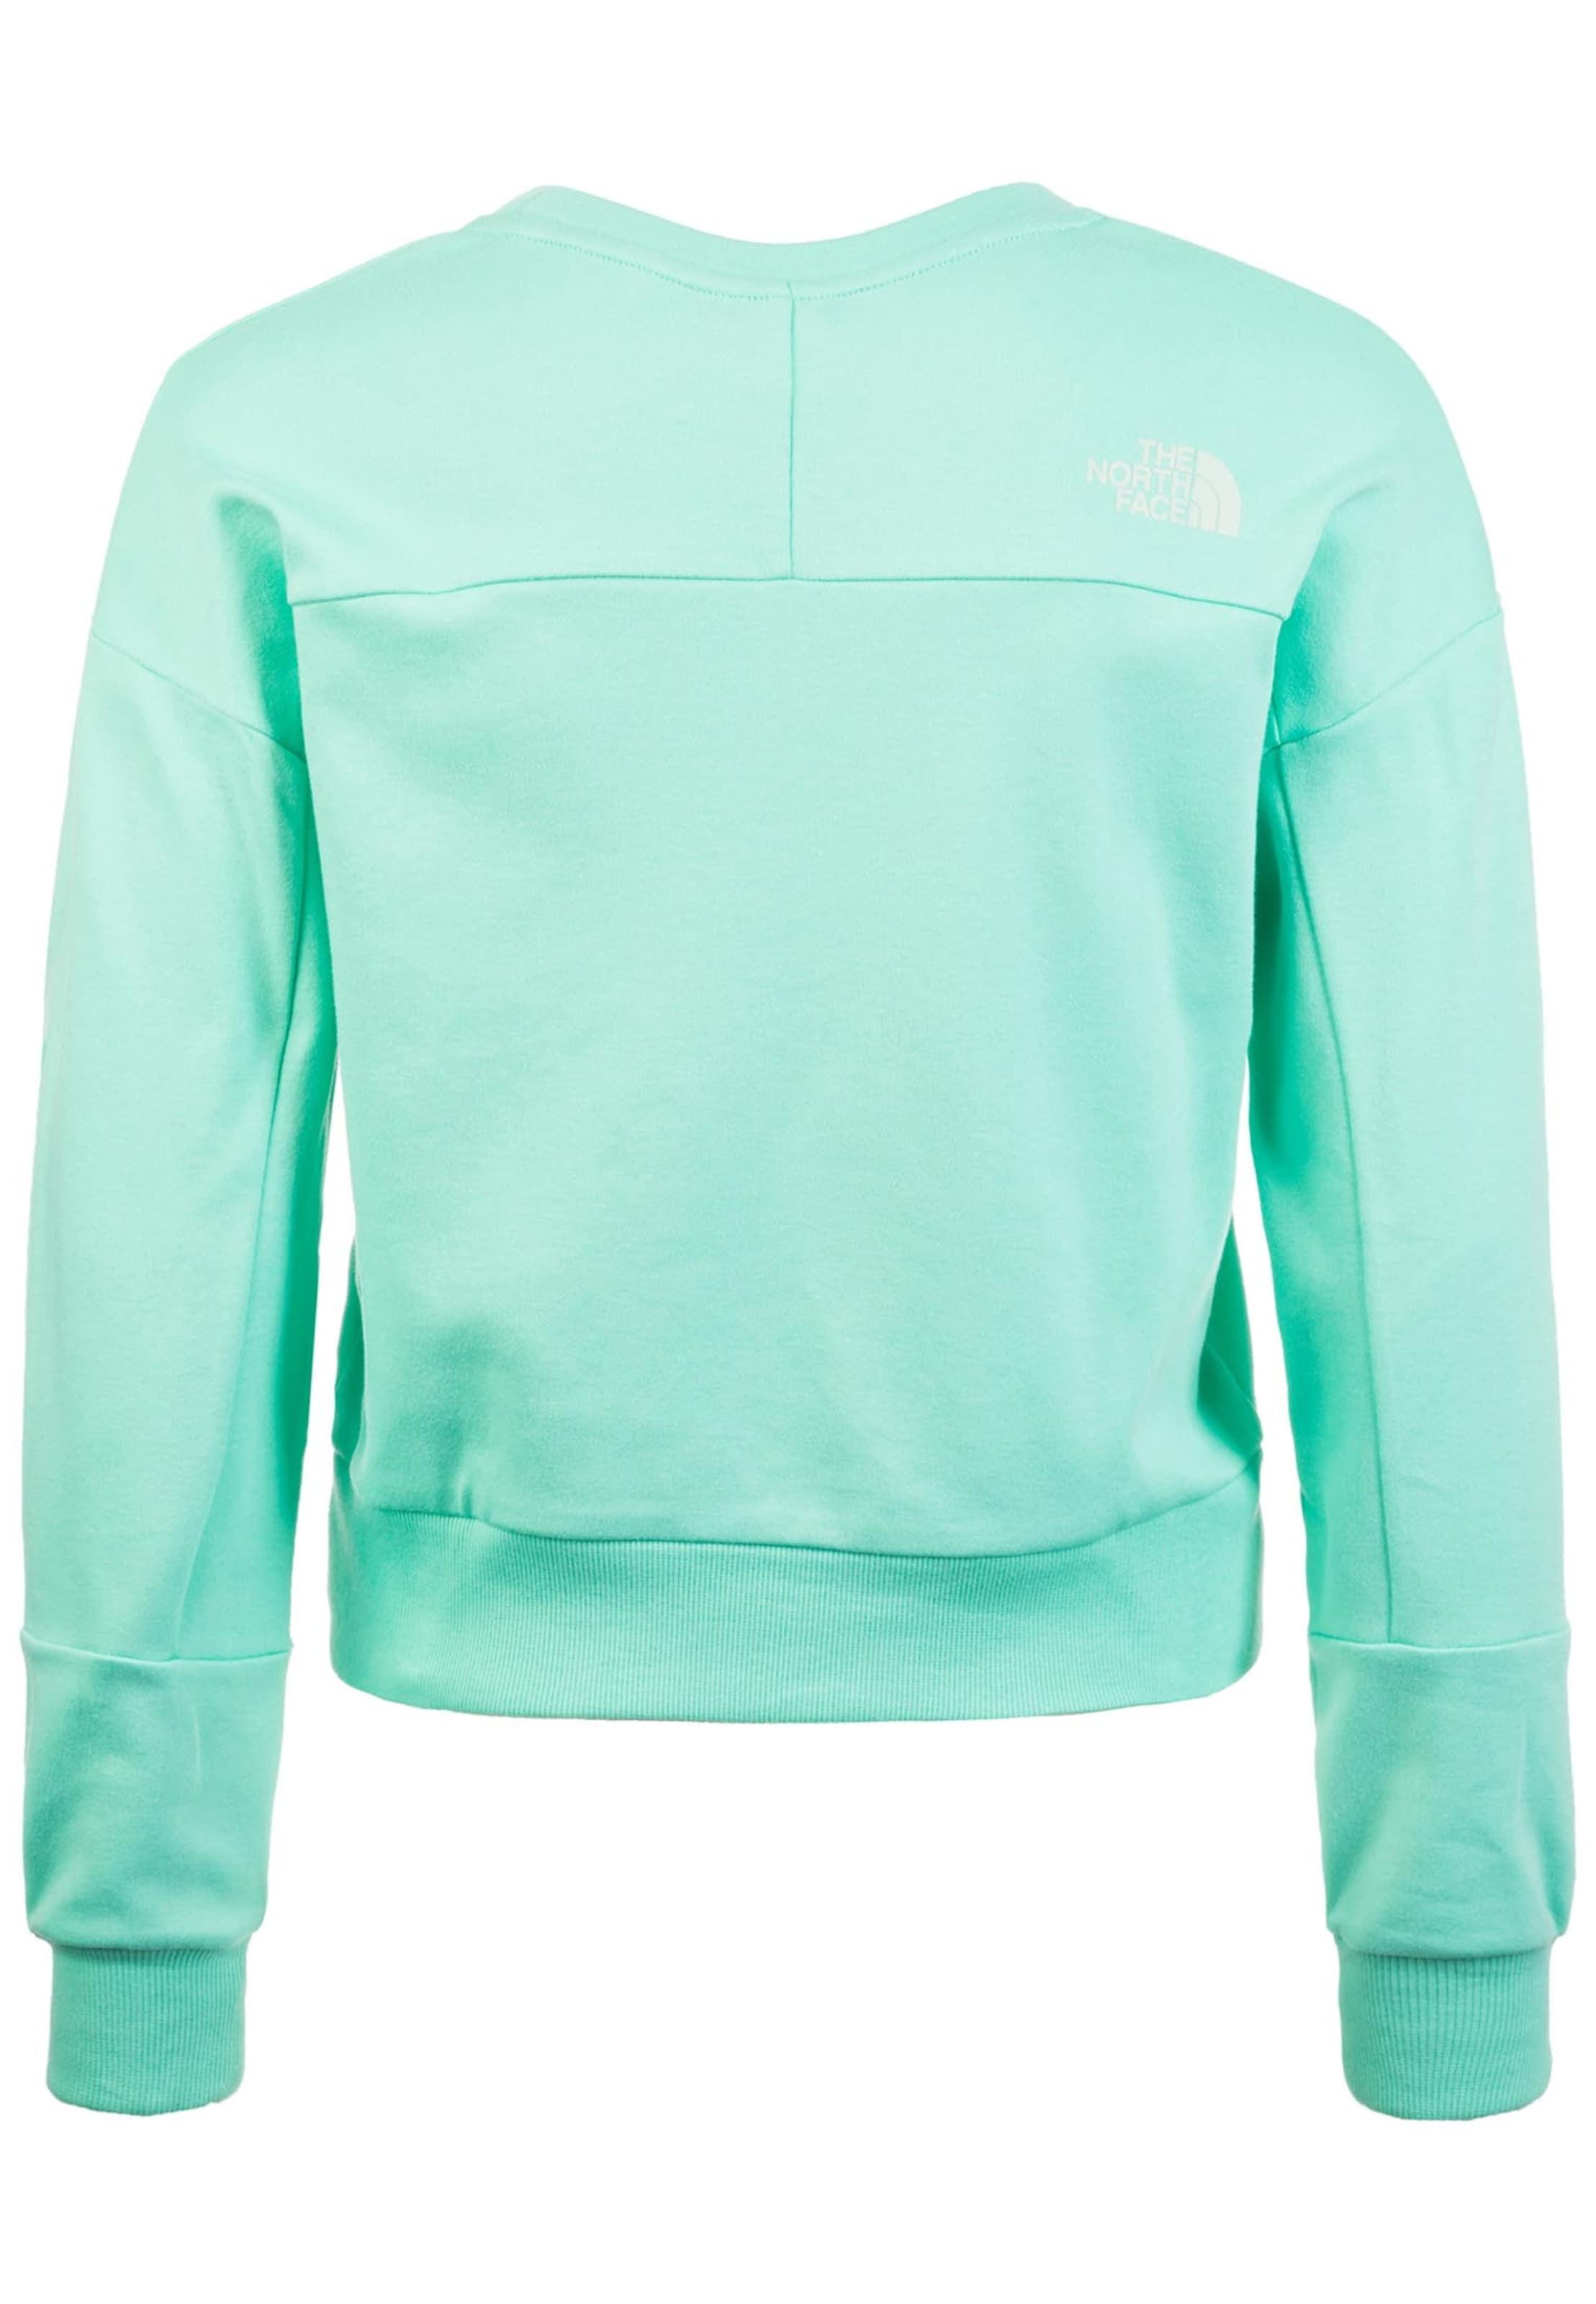 MintJade The Sweatshirt North Face In fgyv7I6Yb